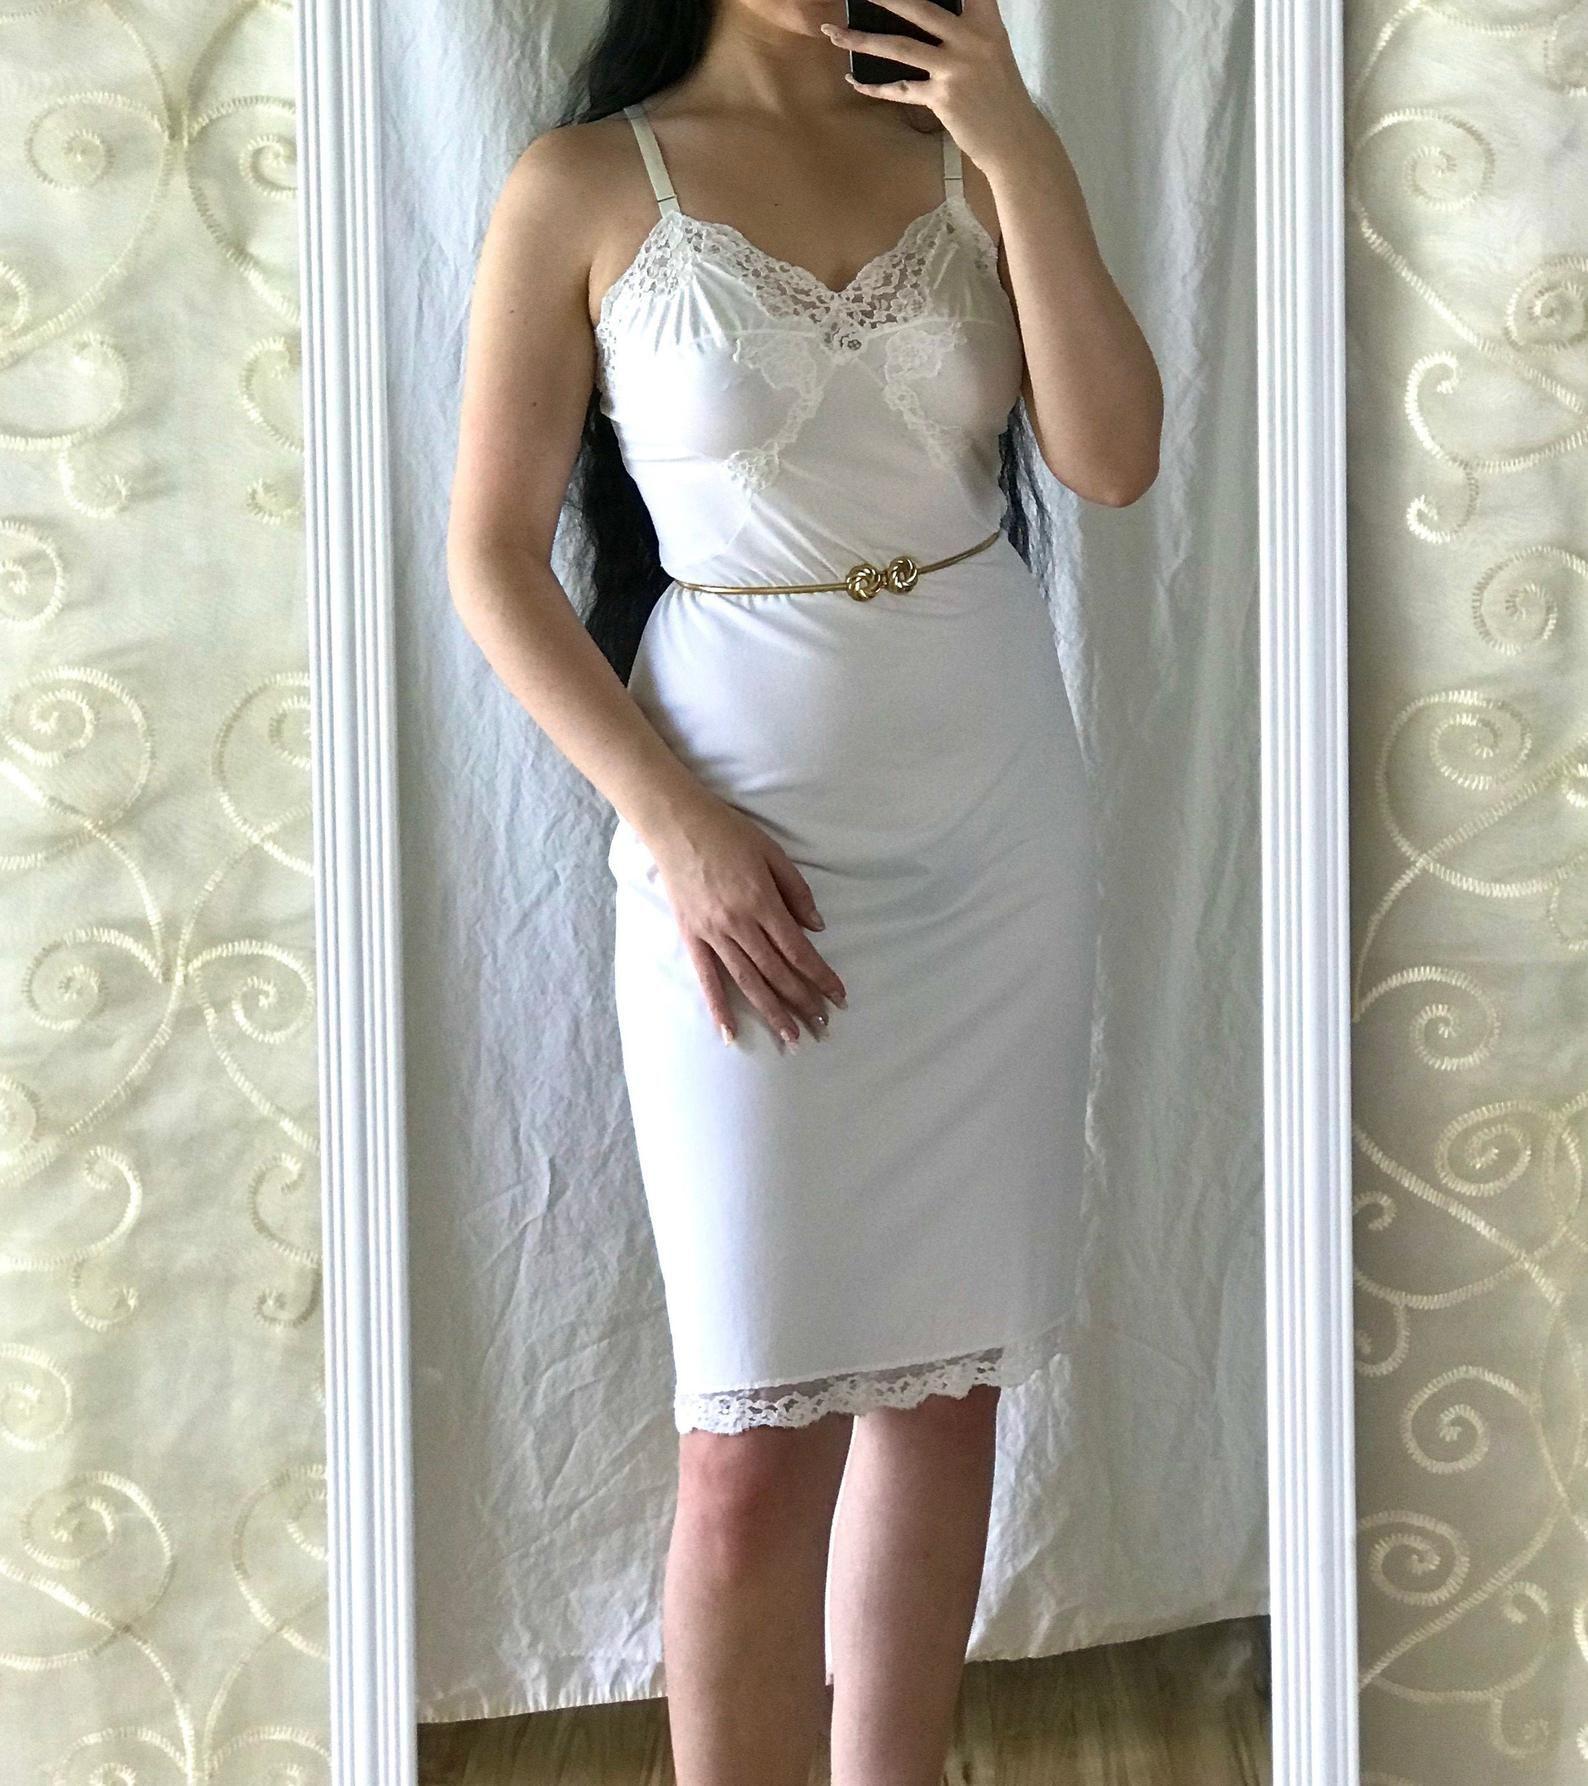 50 S White Satin Slip With Lace Gossard Artemis Lace Slip Dress Satin Slip Lace Slip [ 1786 x 1588 Pixel ]